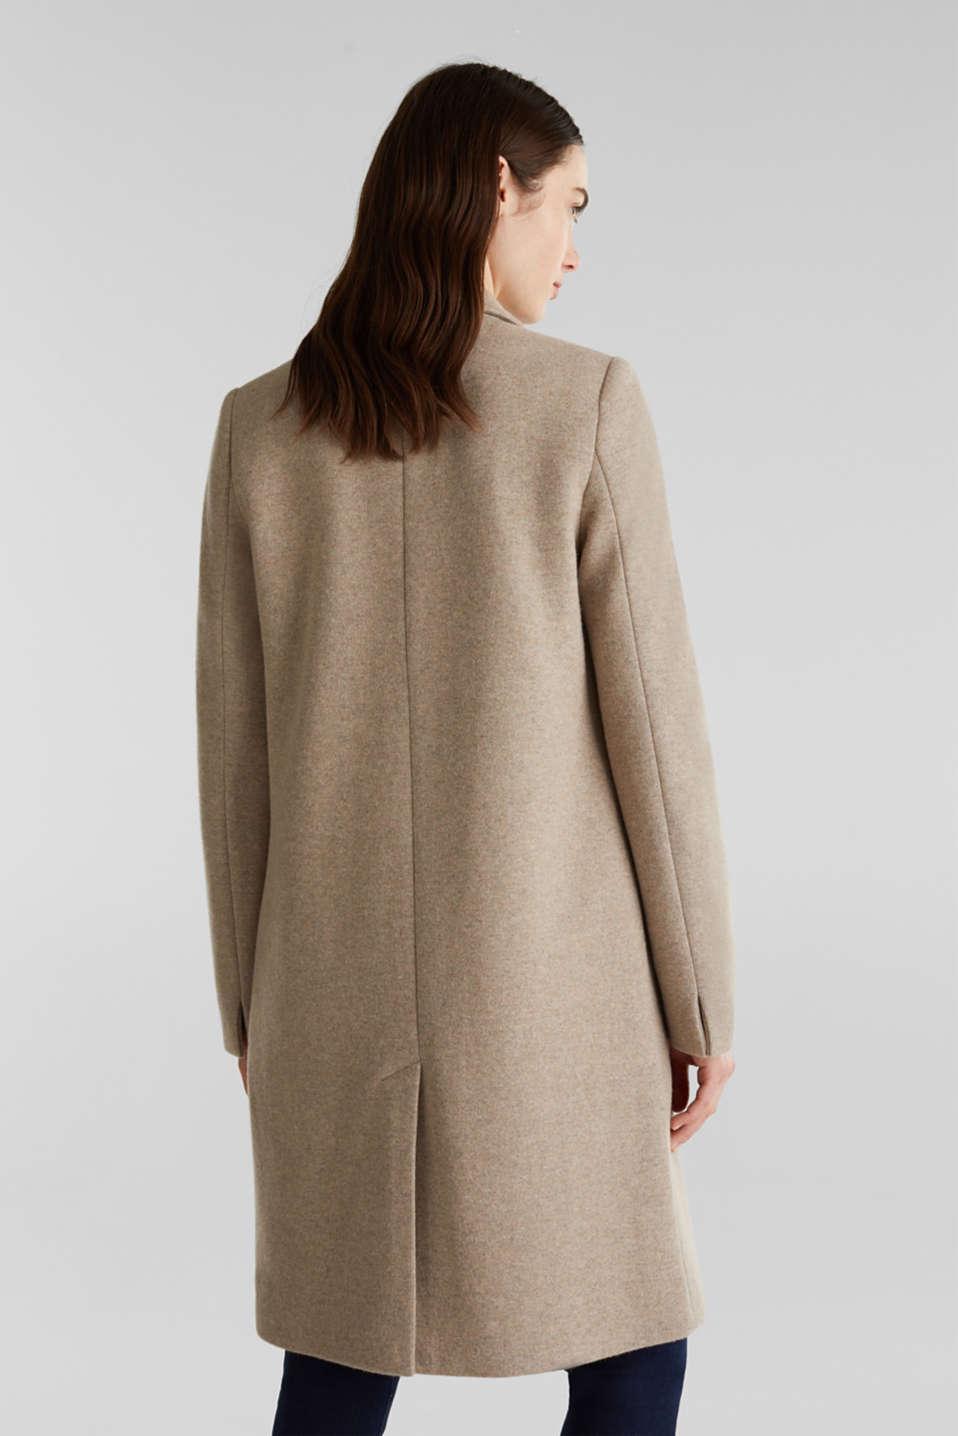 Coats woven, BEIGE 5, detail image number 3